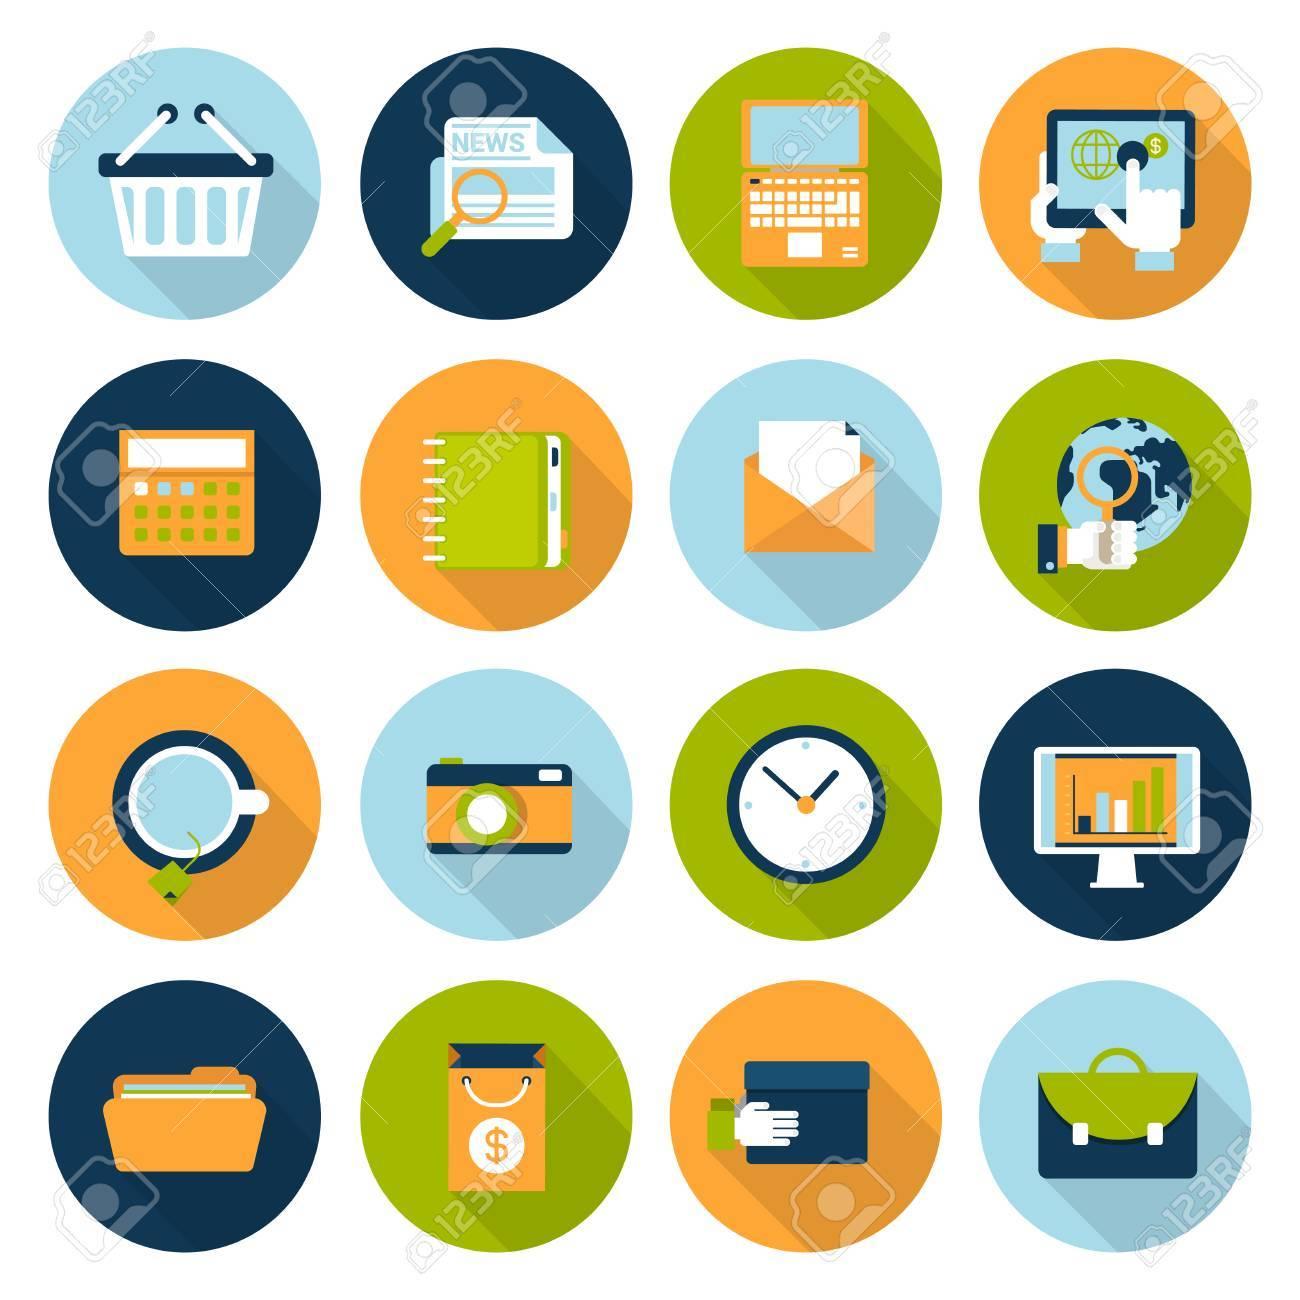 Flat web infographics icon set online business e commerce flat web infographics icon set online business e commerce technology internet altavistaventures Image collections